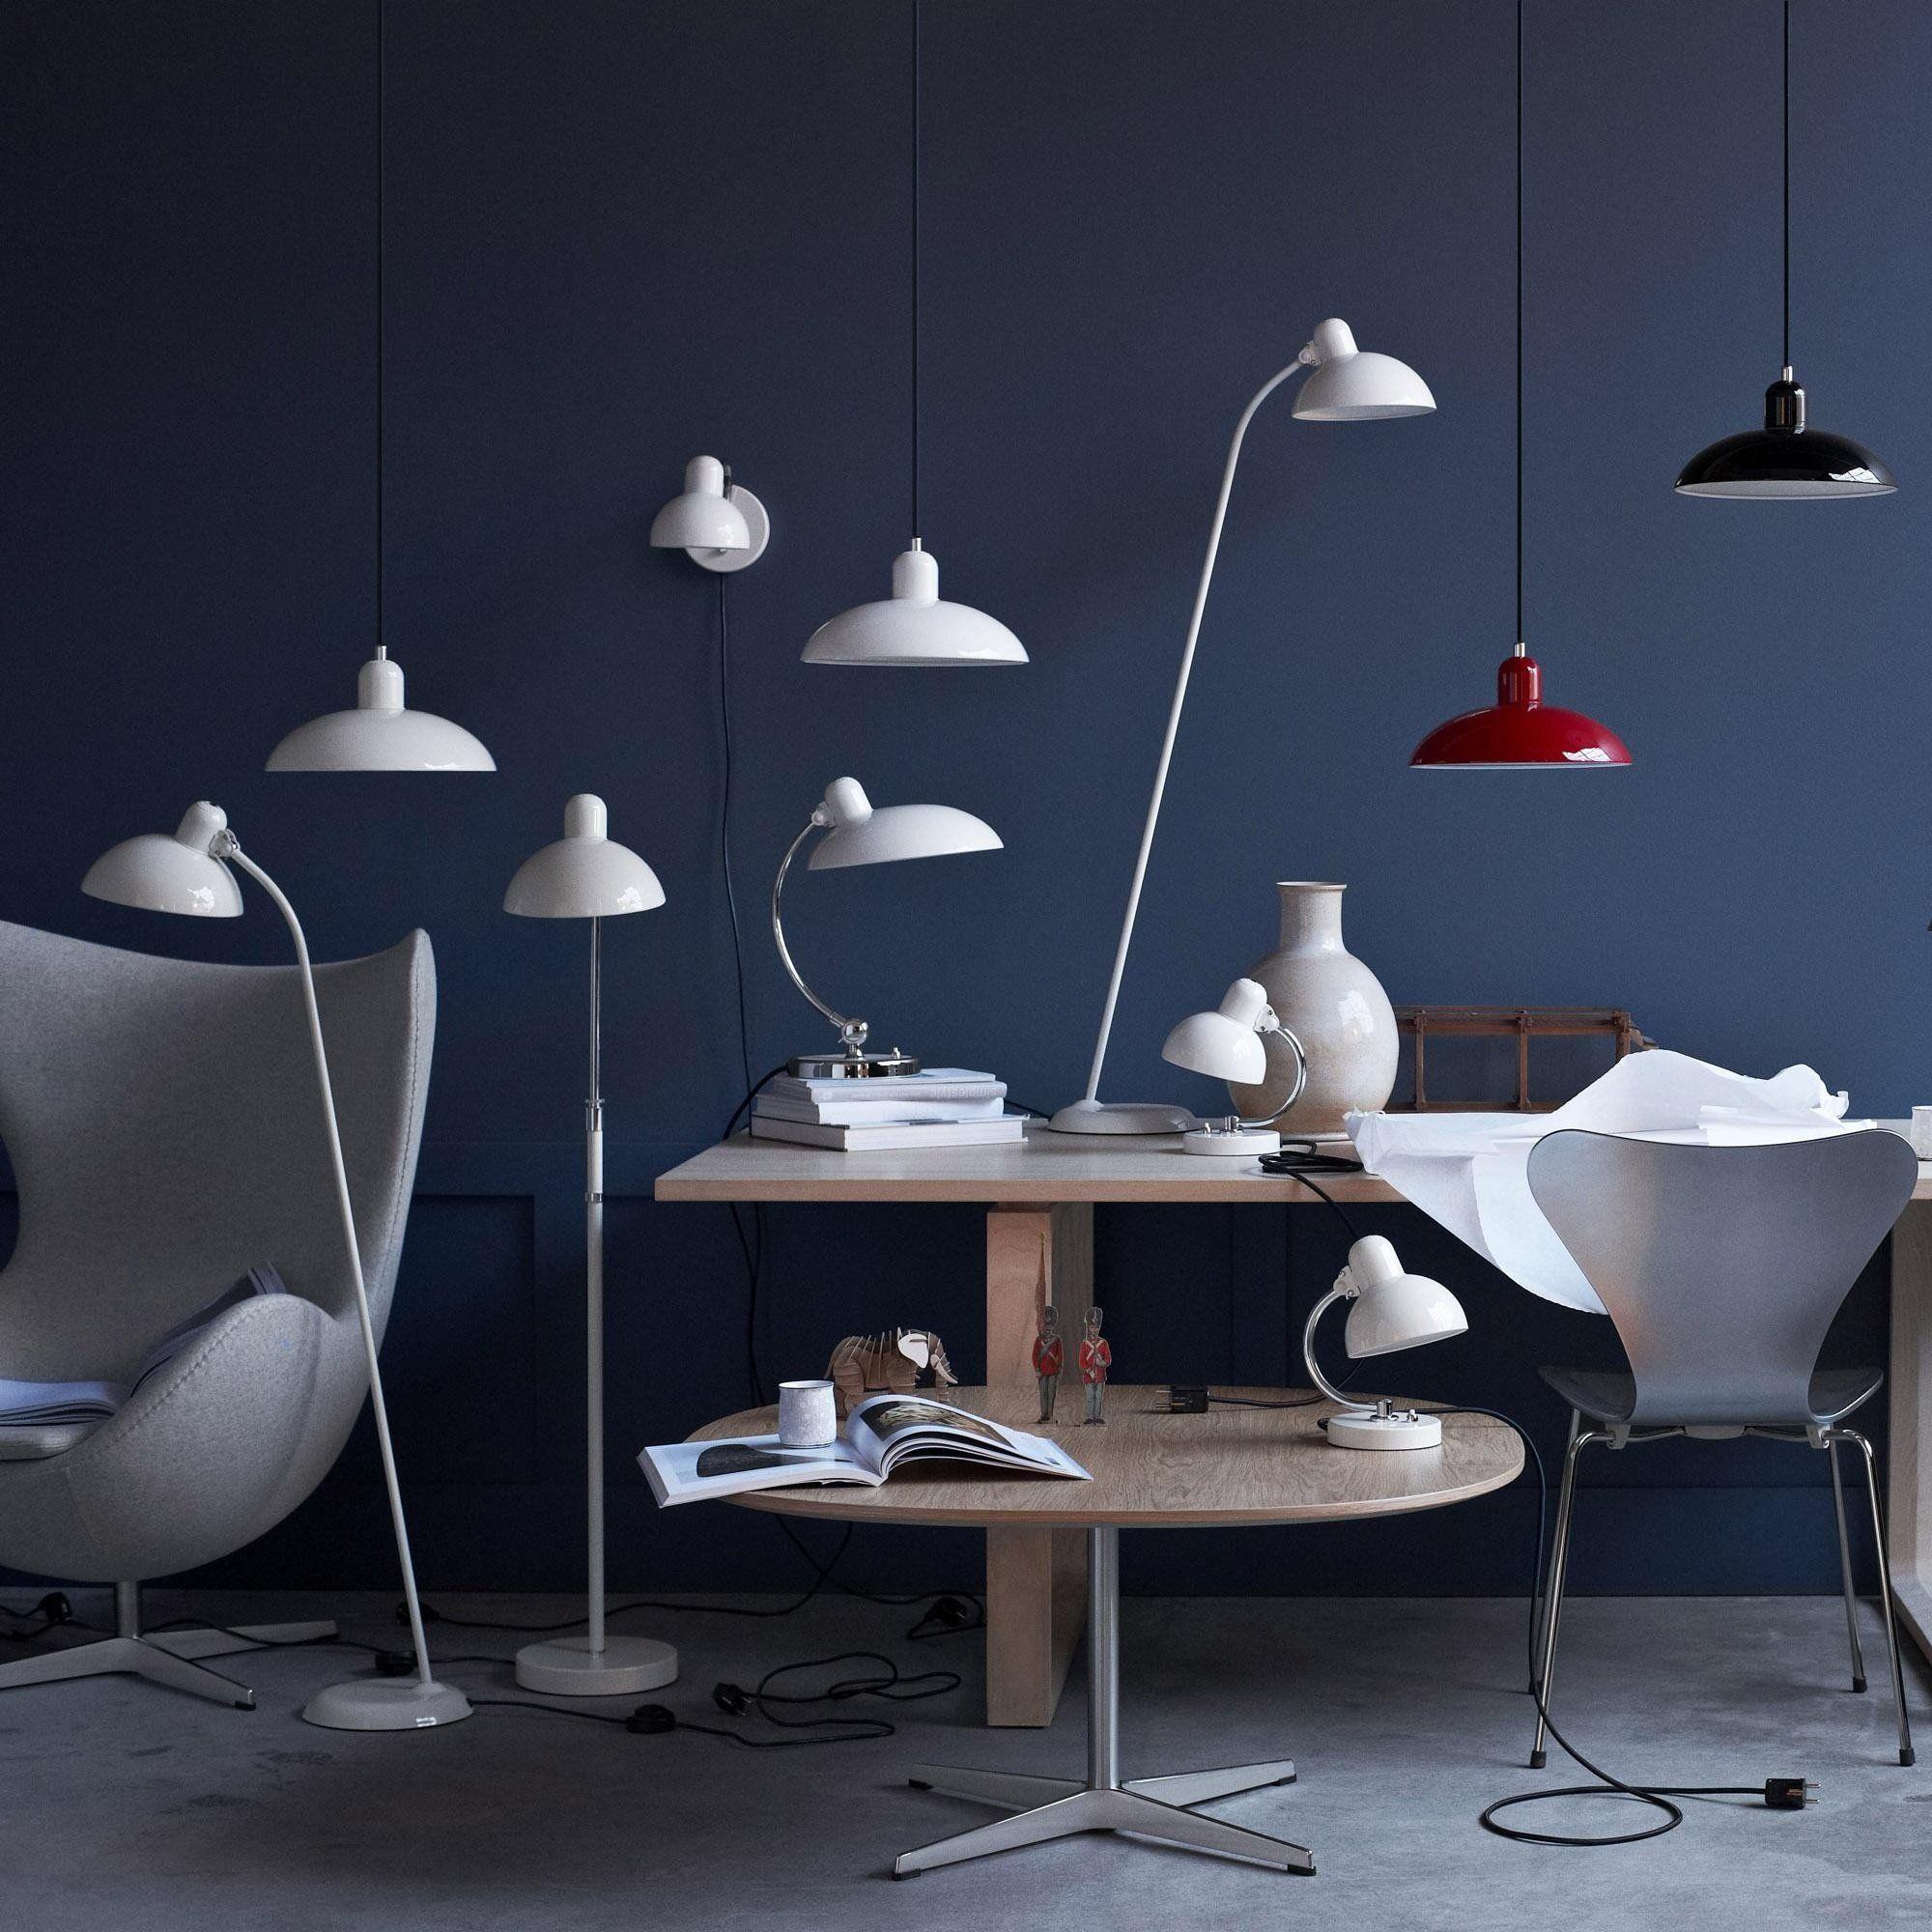 kaiser idell 6631 p suspension lamp ambientedirect. Black Bedroom Furniture Sets. Home Design Ideas